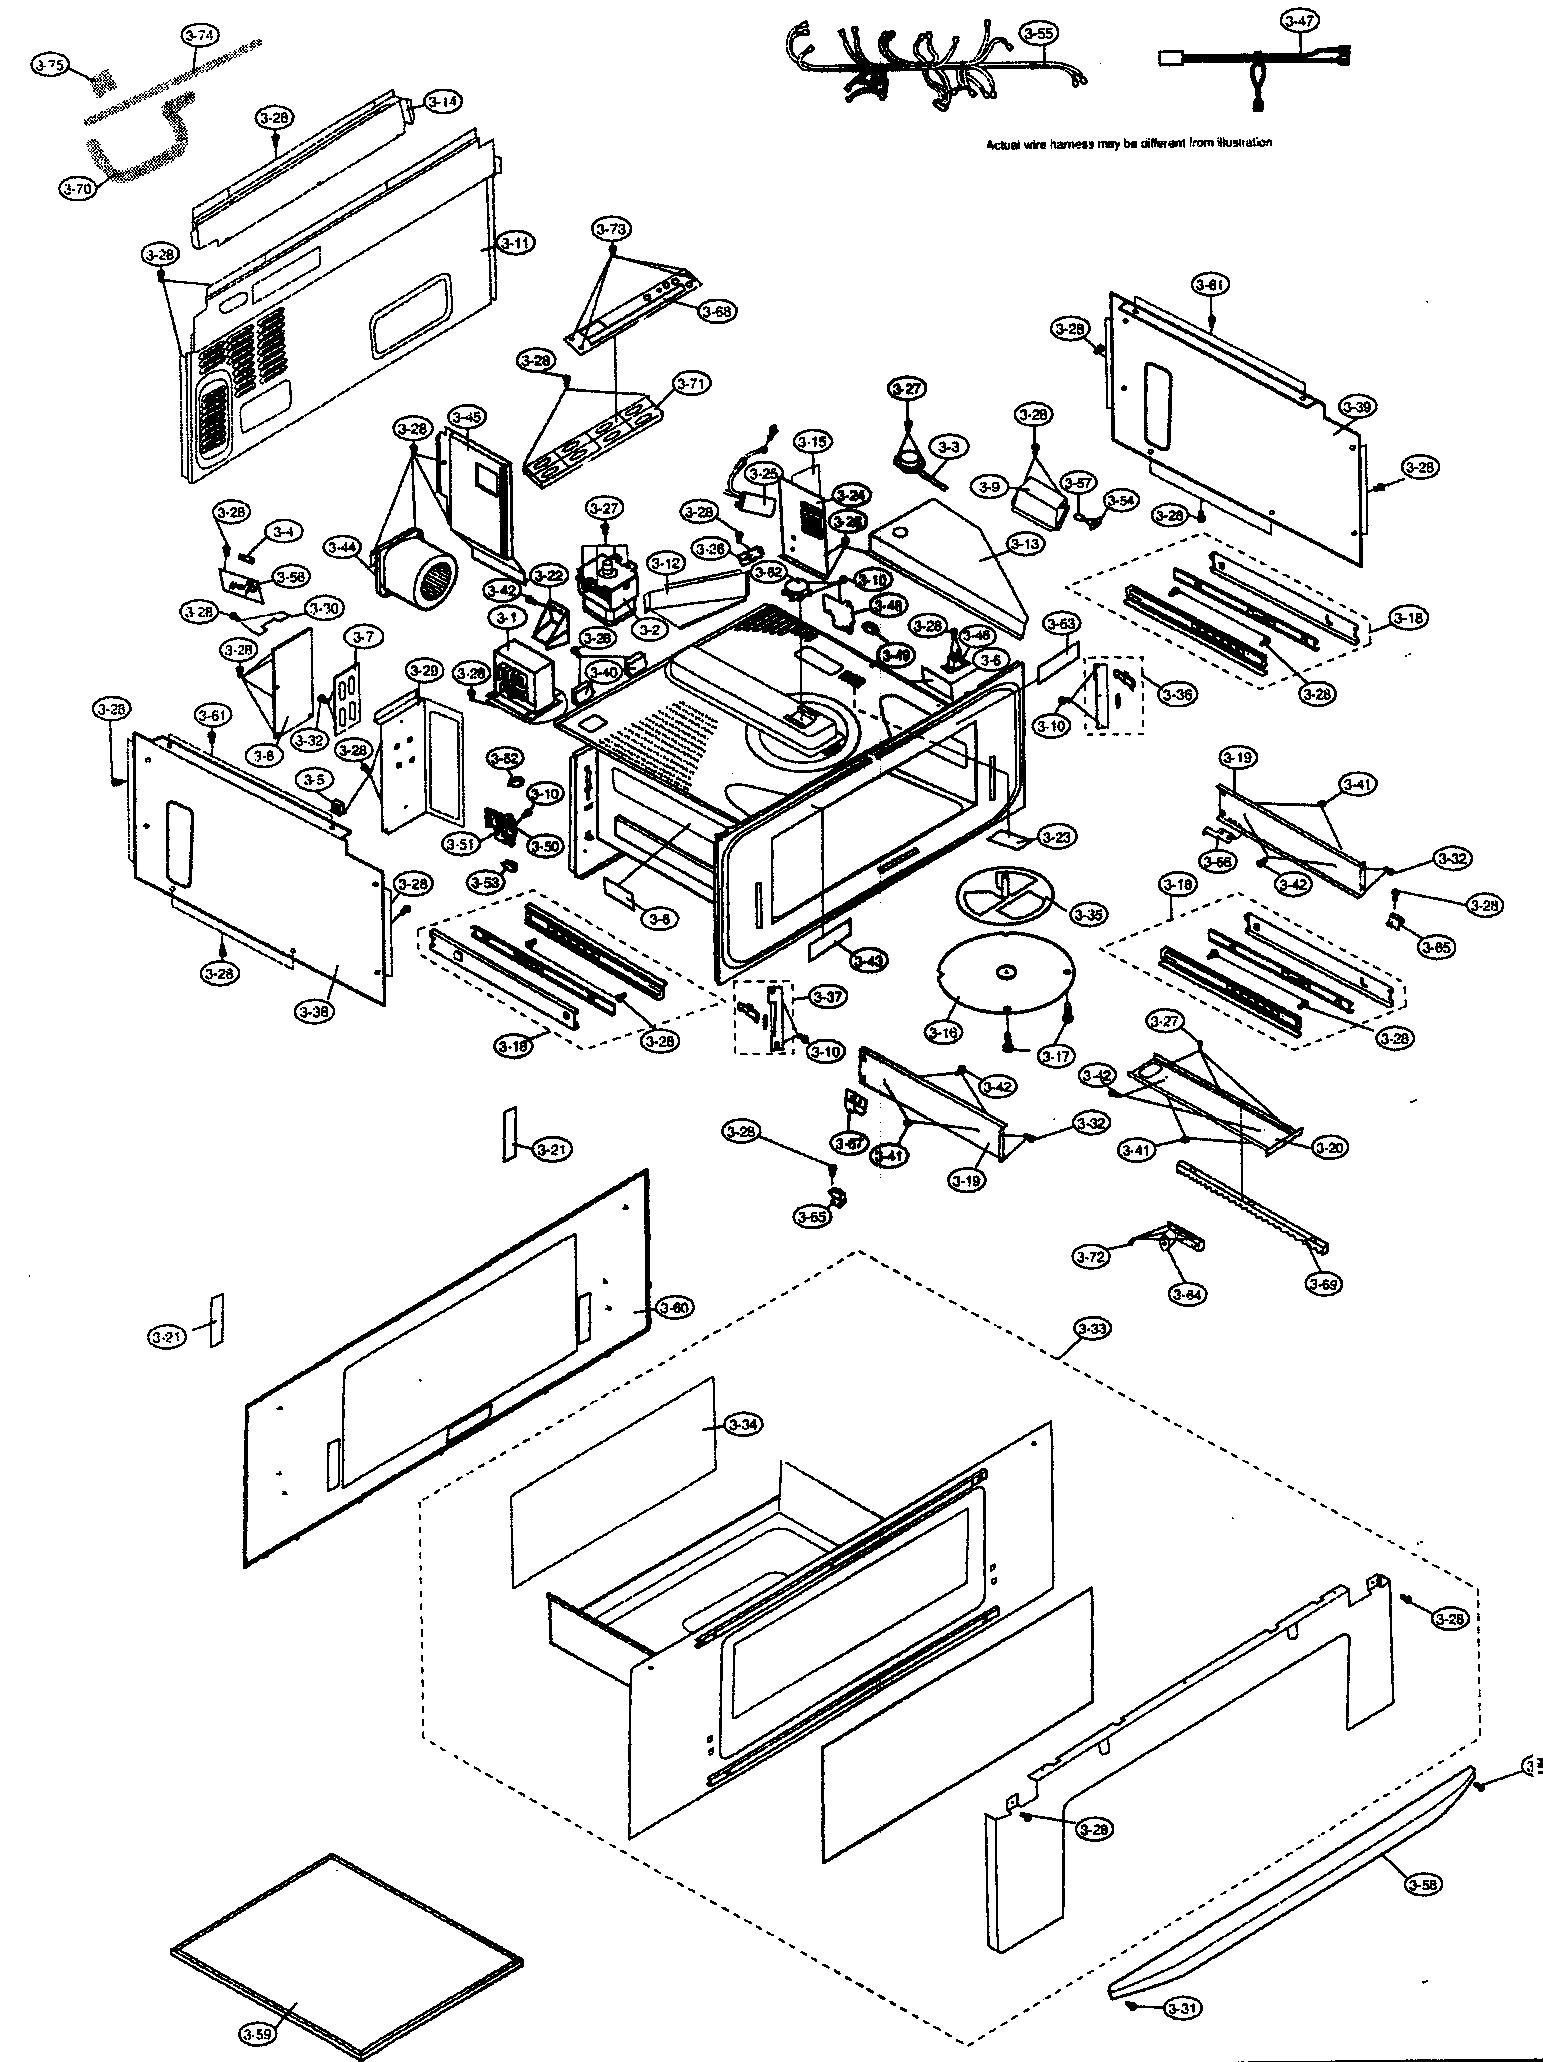 hight resolution of 95 mazda 626 engine diagram